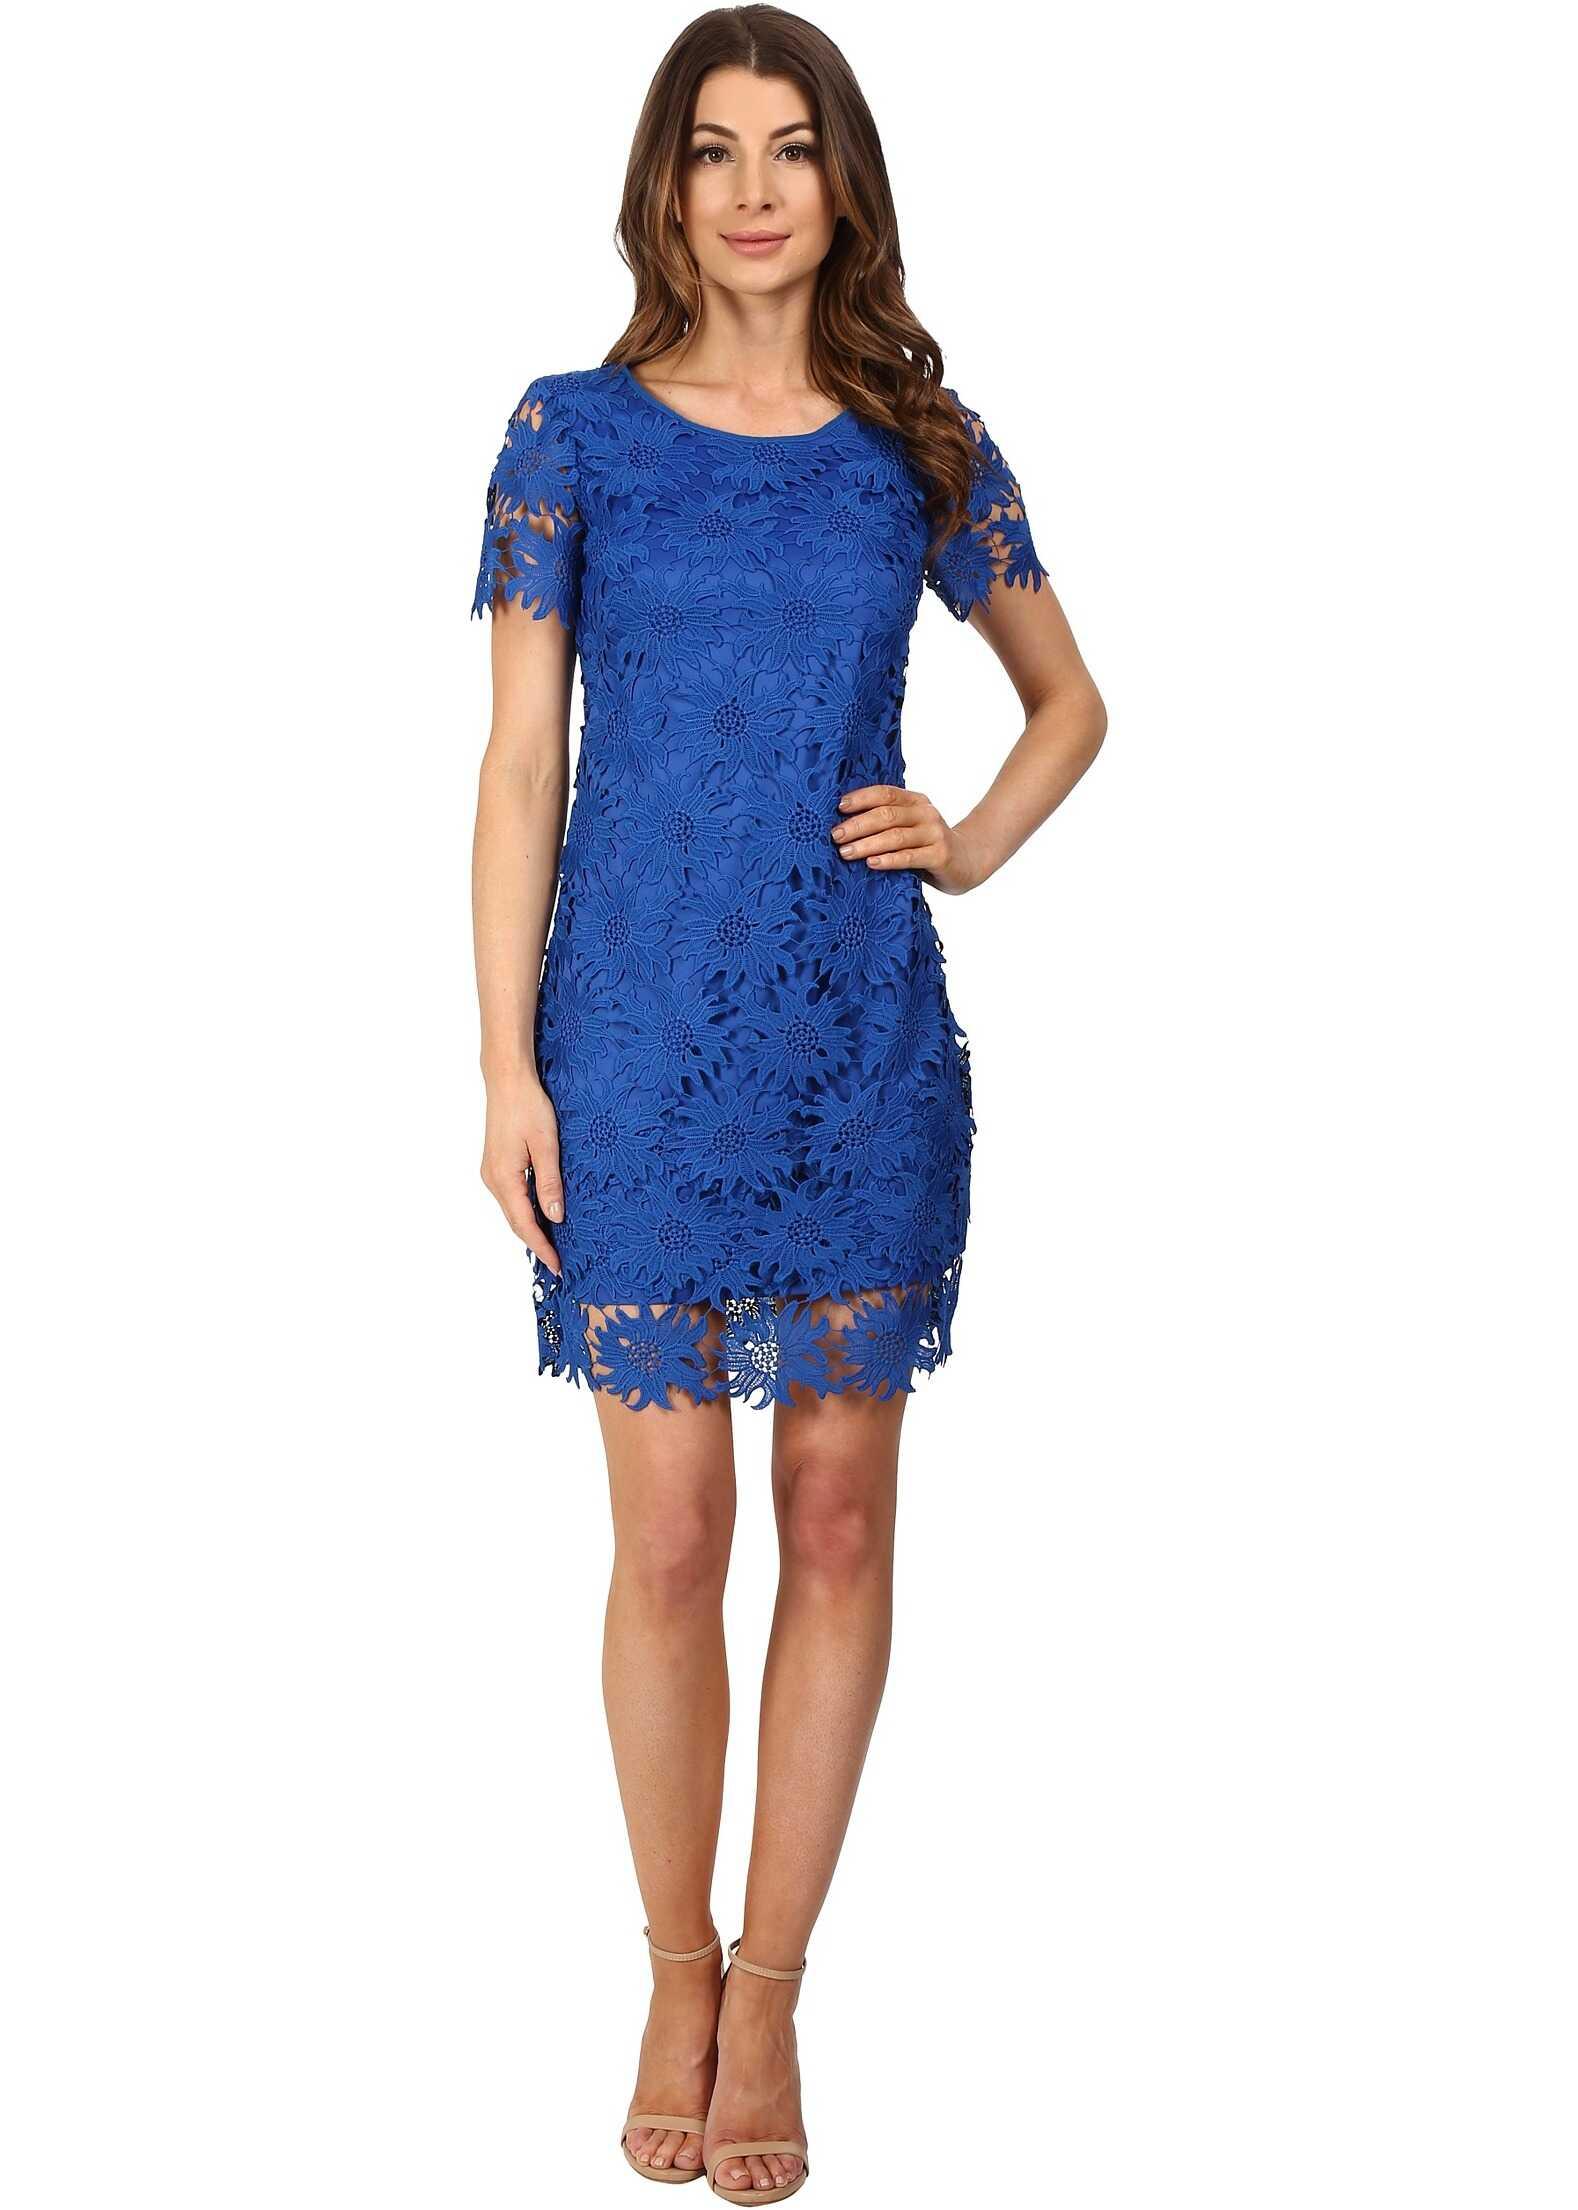 Adrianna Papell Scalloped Lace Flounce Hem Dress Royal